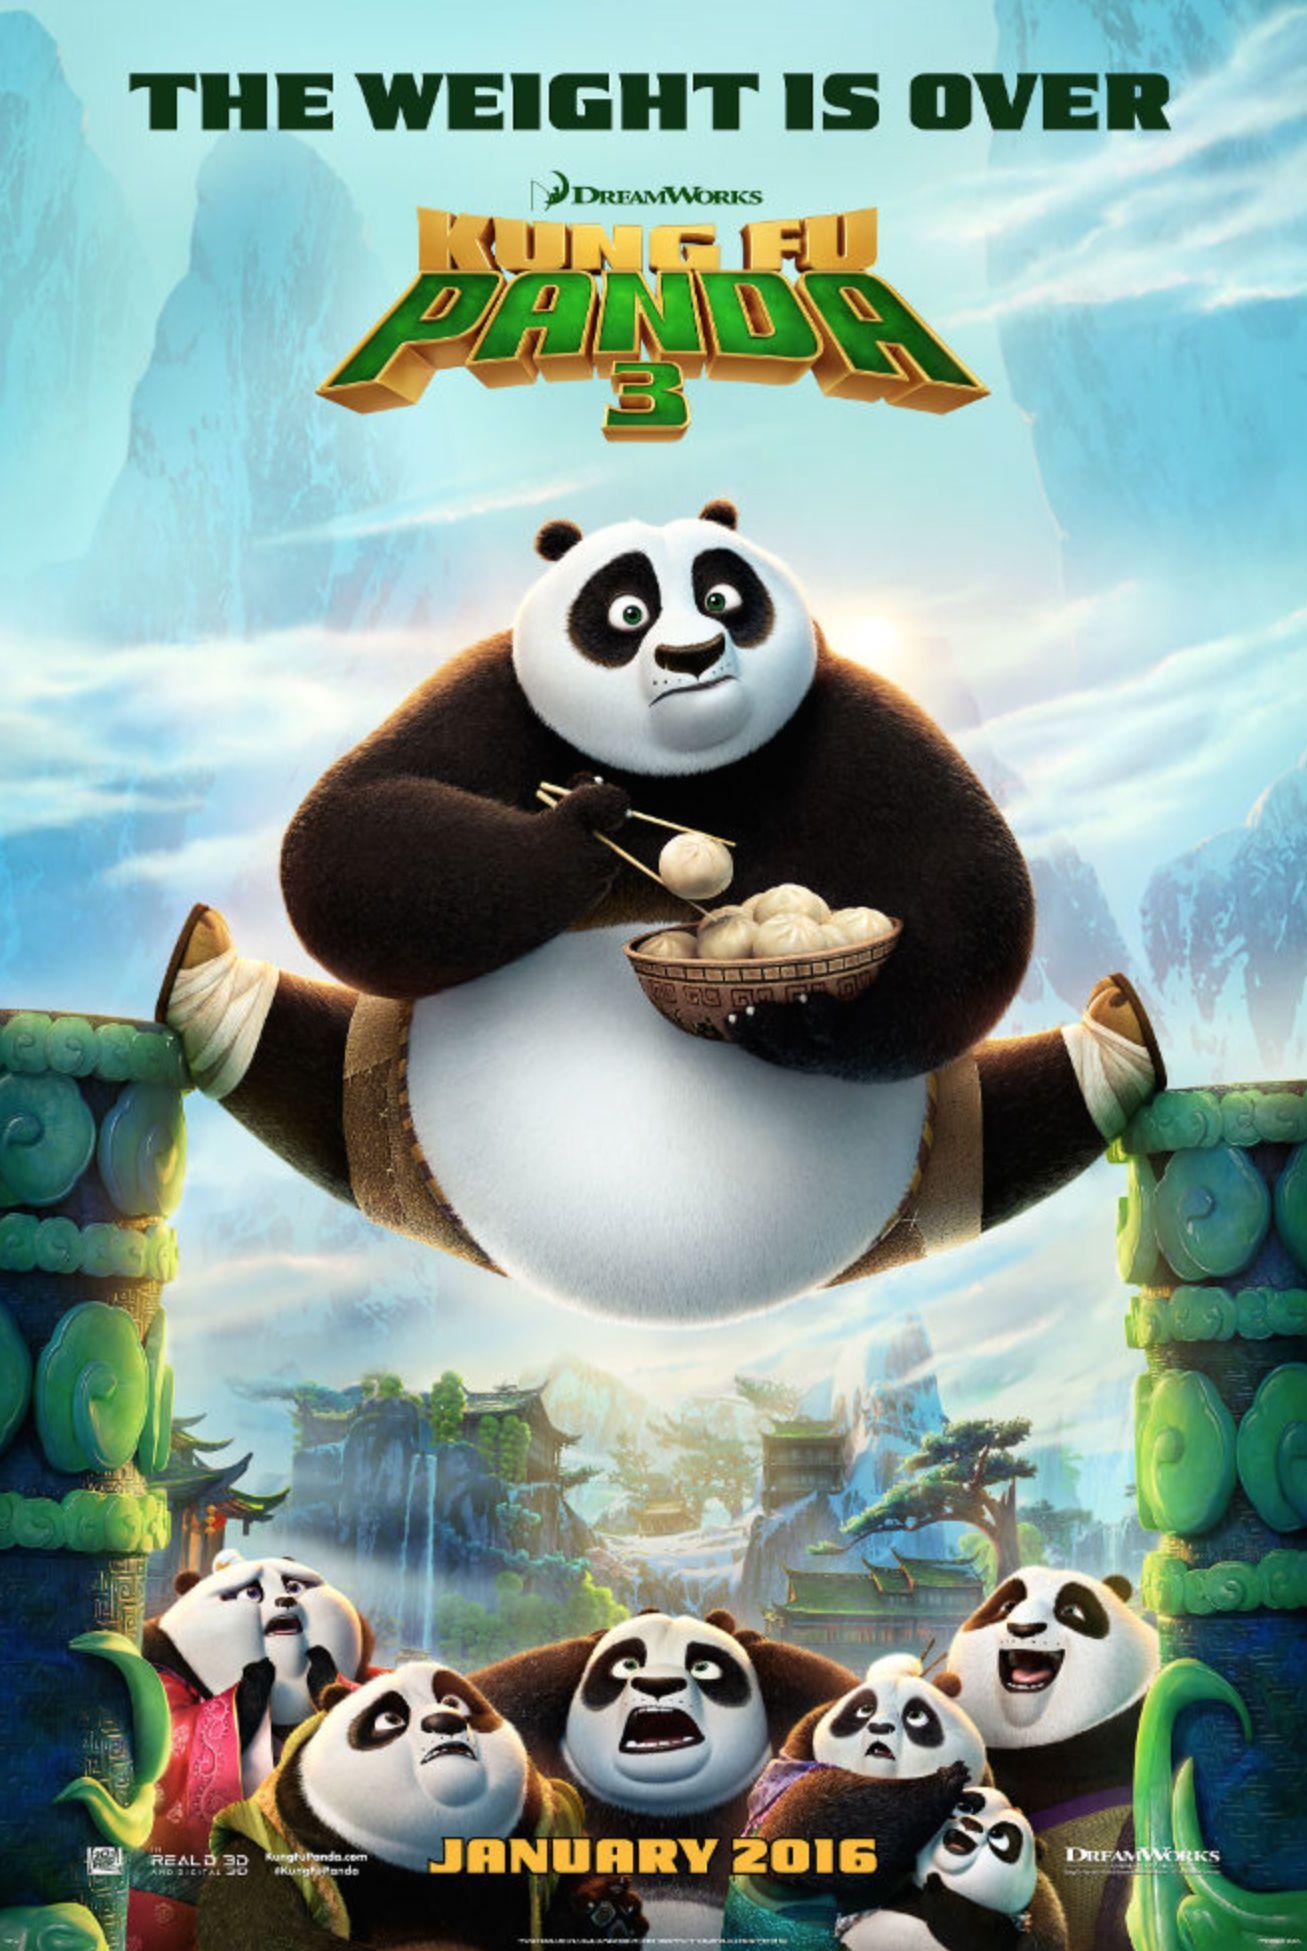 Kung Fu Panda 3 Gets A Star Wars Themed Trailer Kung Fu Panda Kung Fu Panda 3 Disney Films